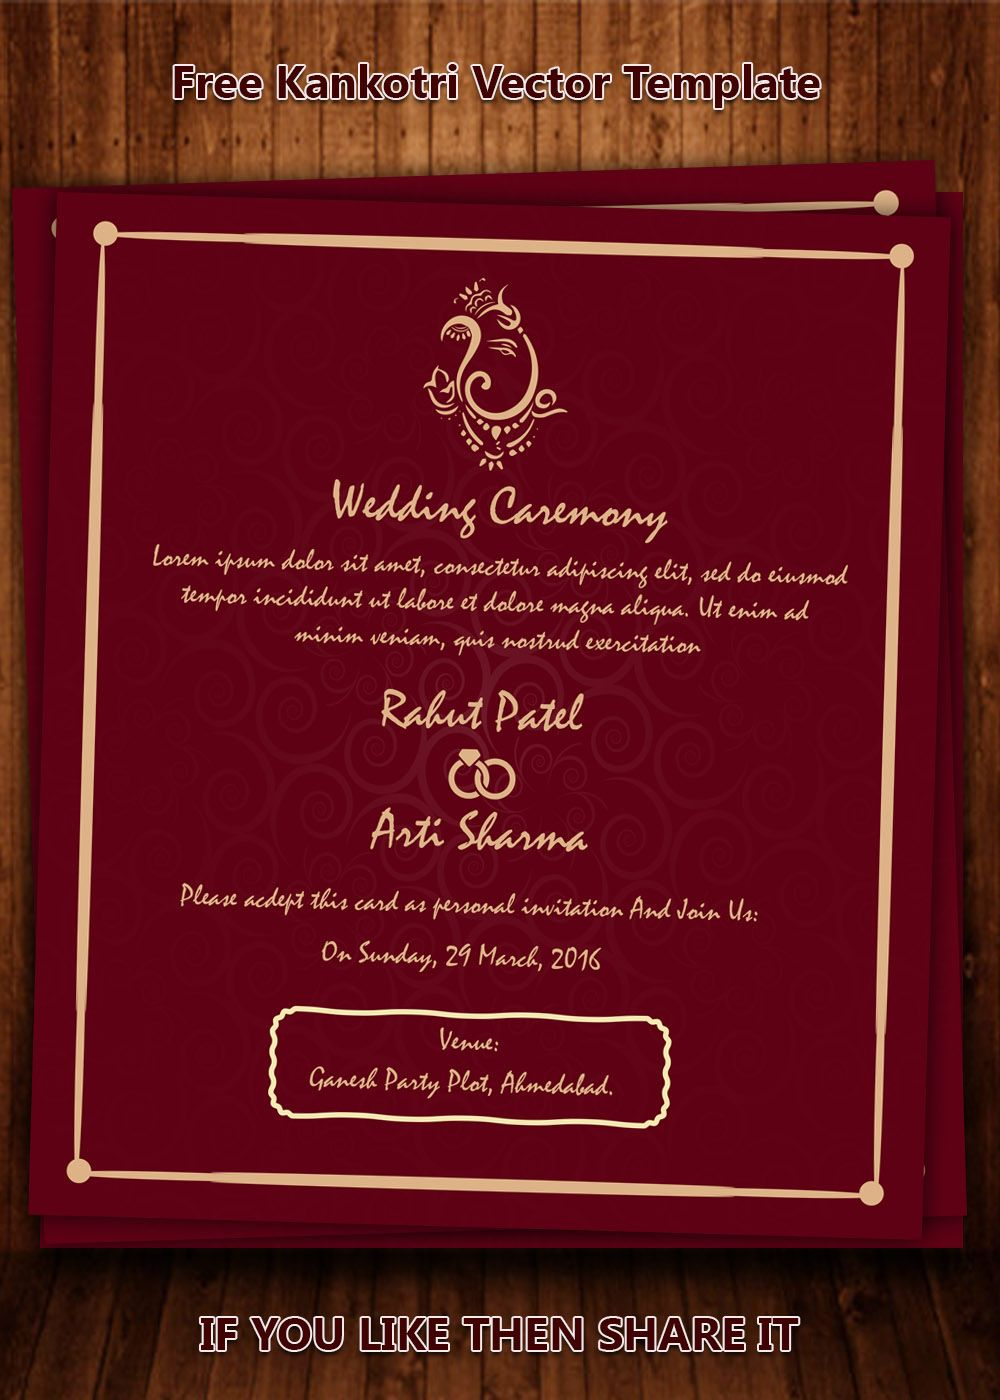 Modern wedding card templates | Kankotri Vector Template | Pinterest ...